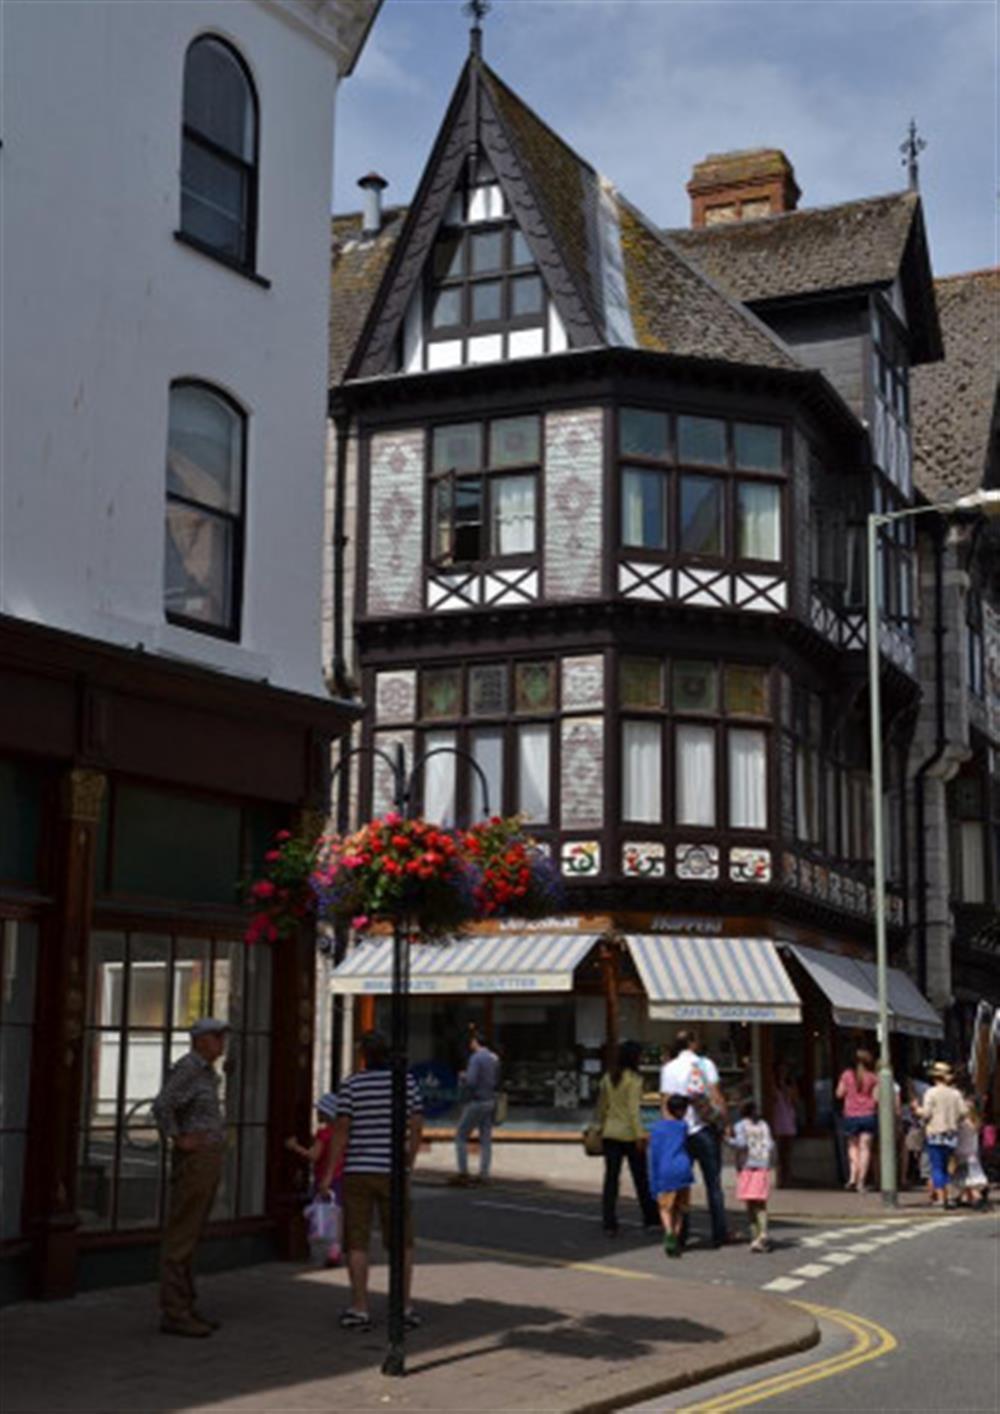 Elizabethan house, Dartmouth at 4 Kings Quay, Dartmouth